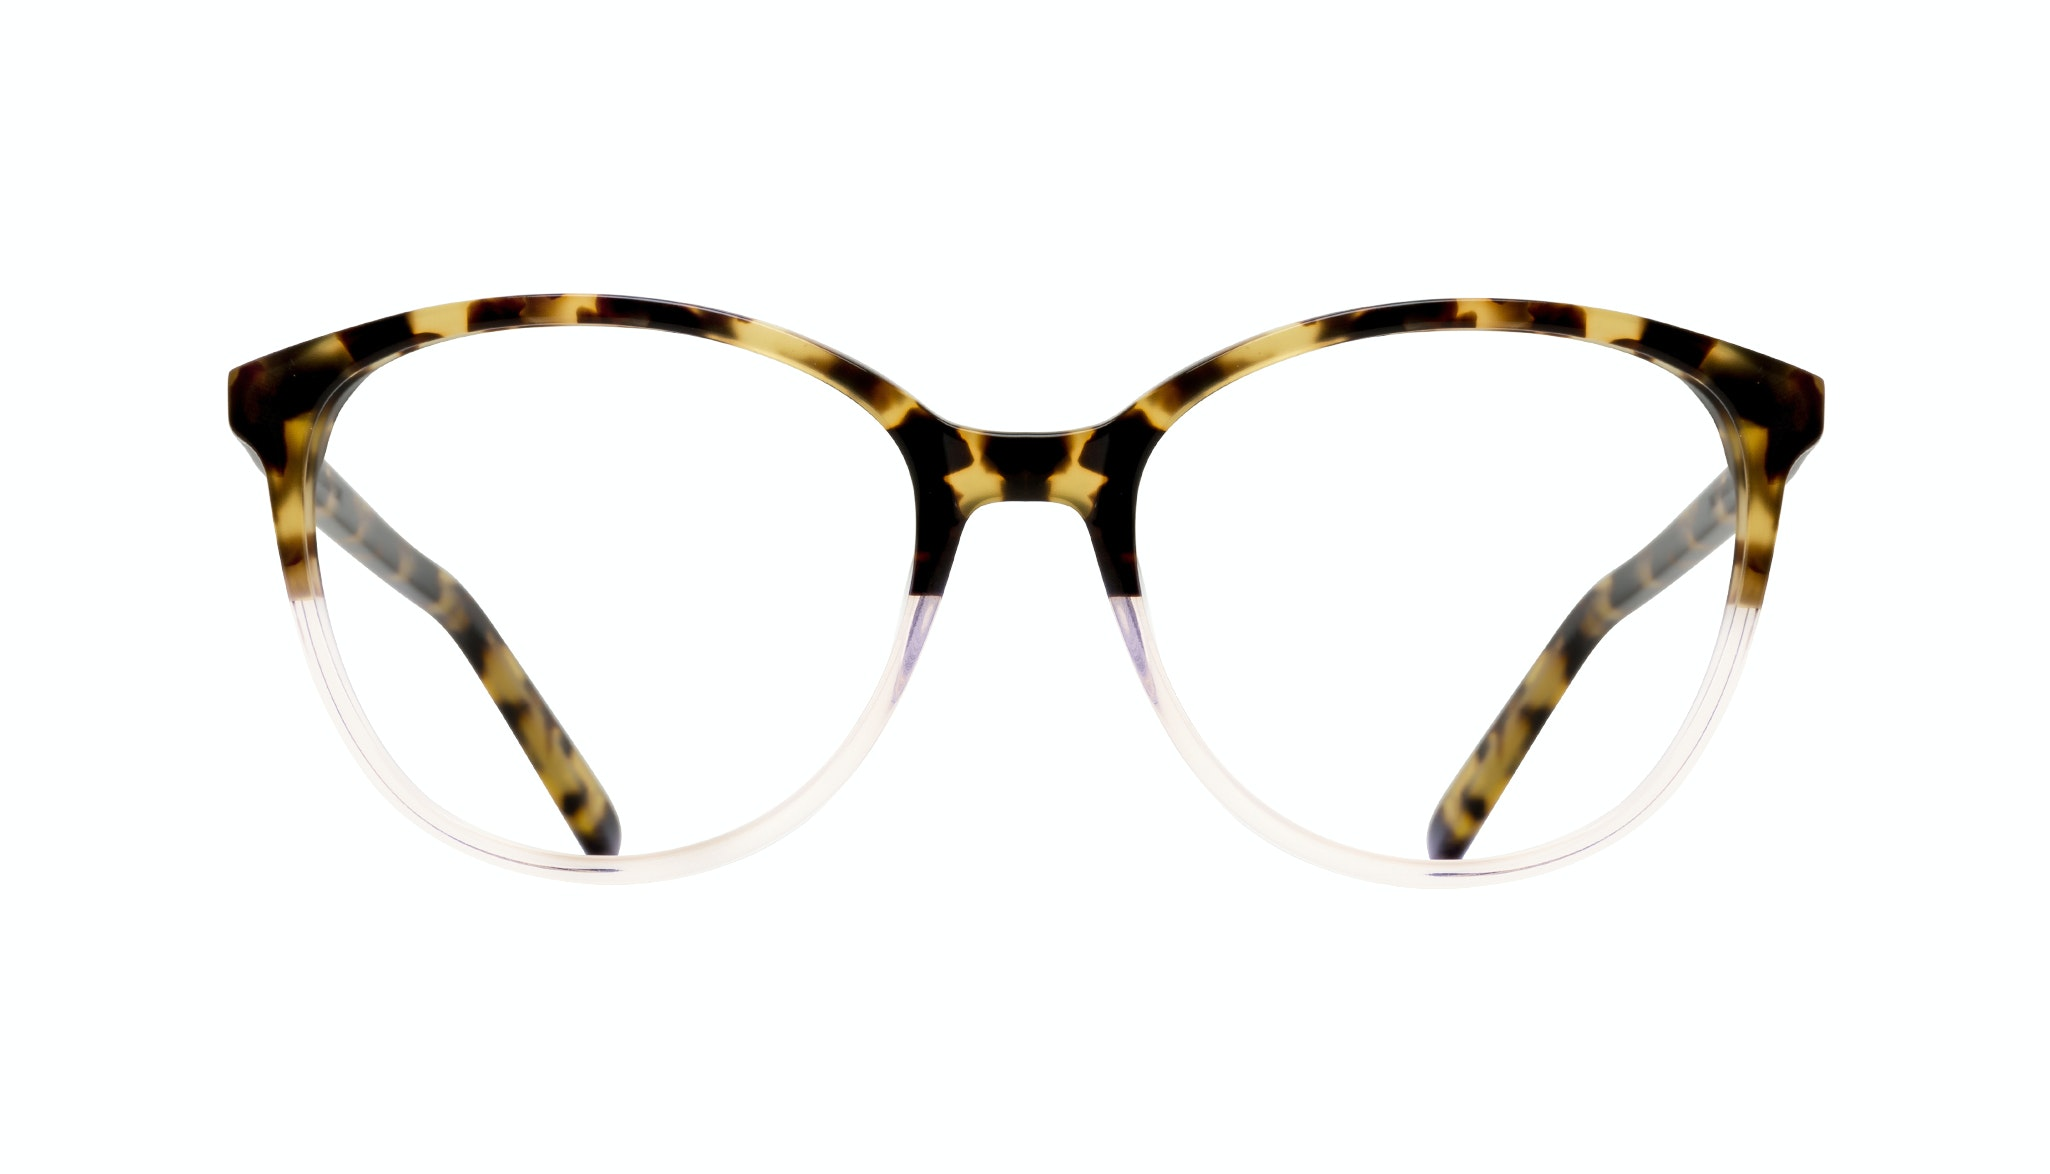 Affordable Fashion Glasses Round Eyeglasses Women Imagine Blond Tort Front